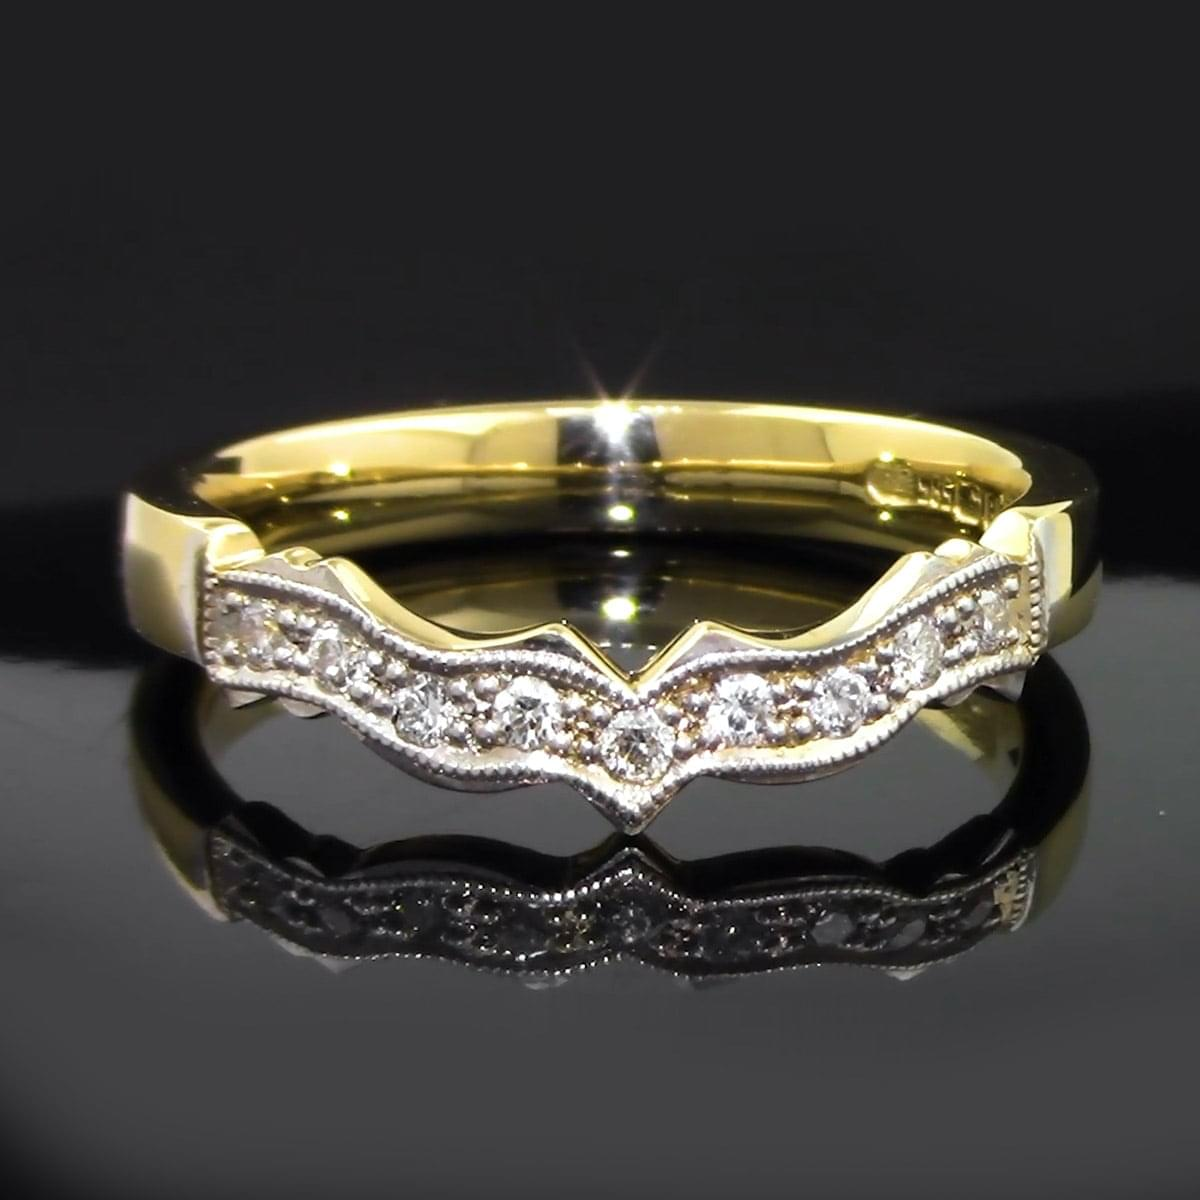 Diamond Claddagh Wedding Ring In 14k Gold